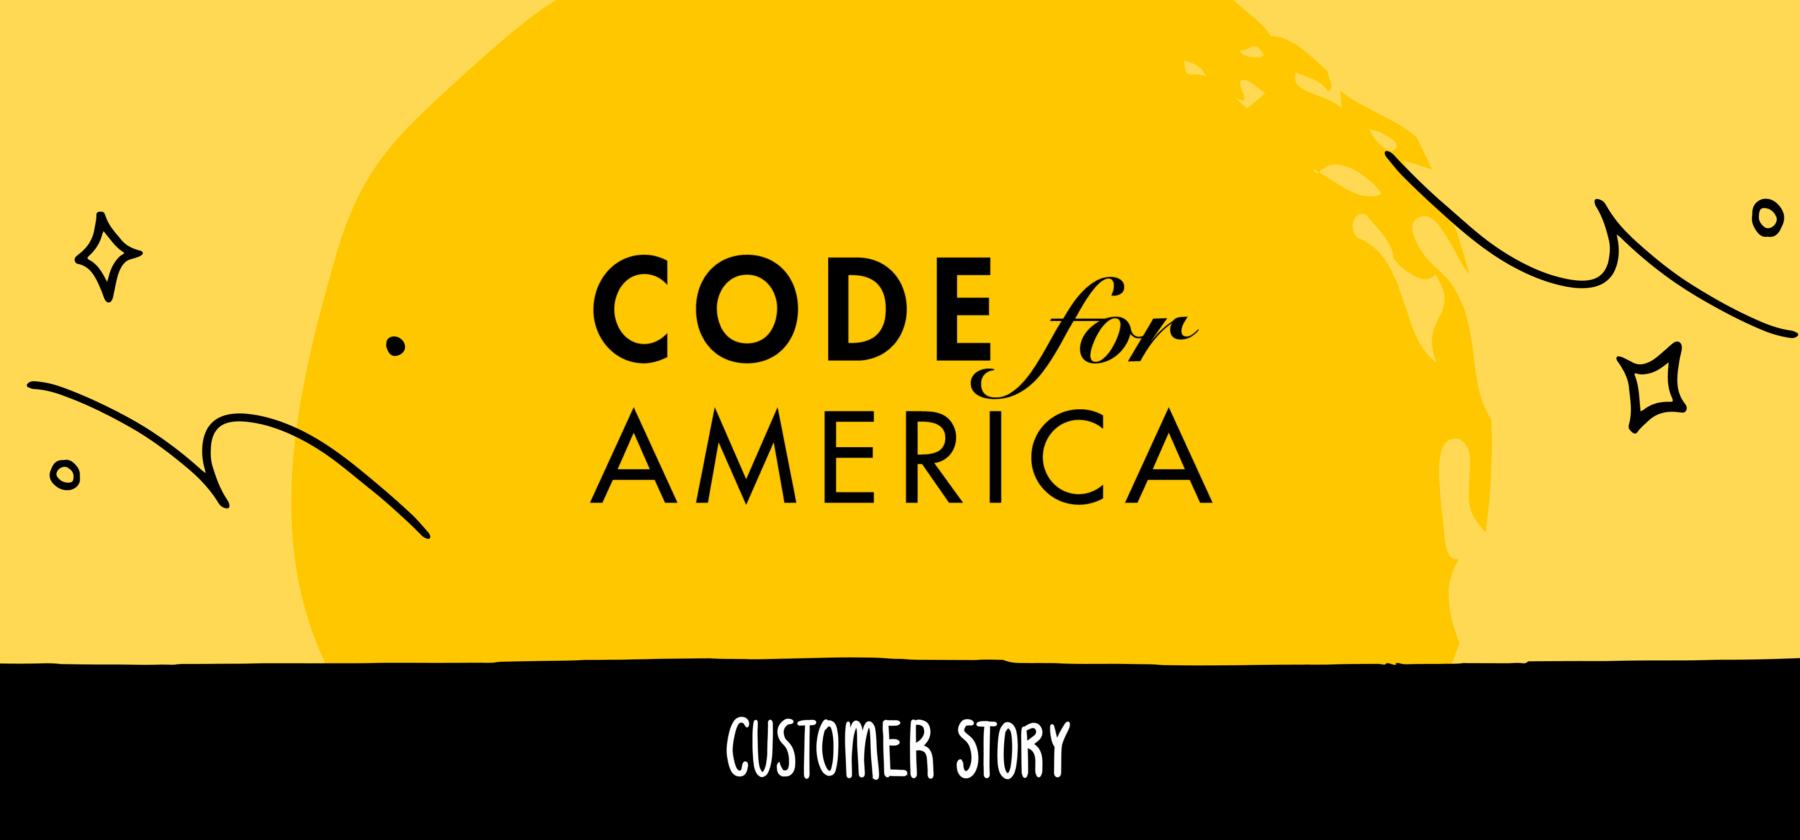 Code for America Intercom customer story